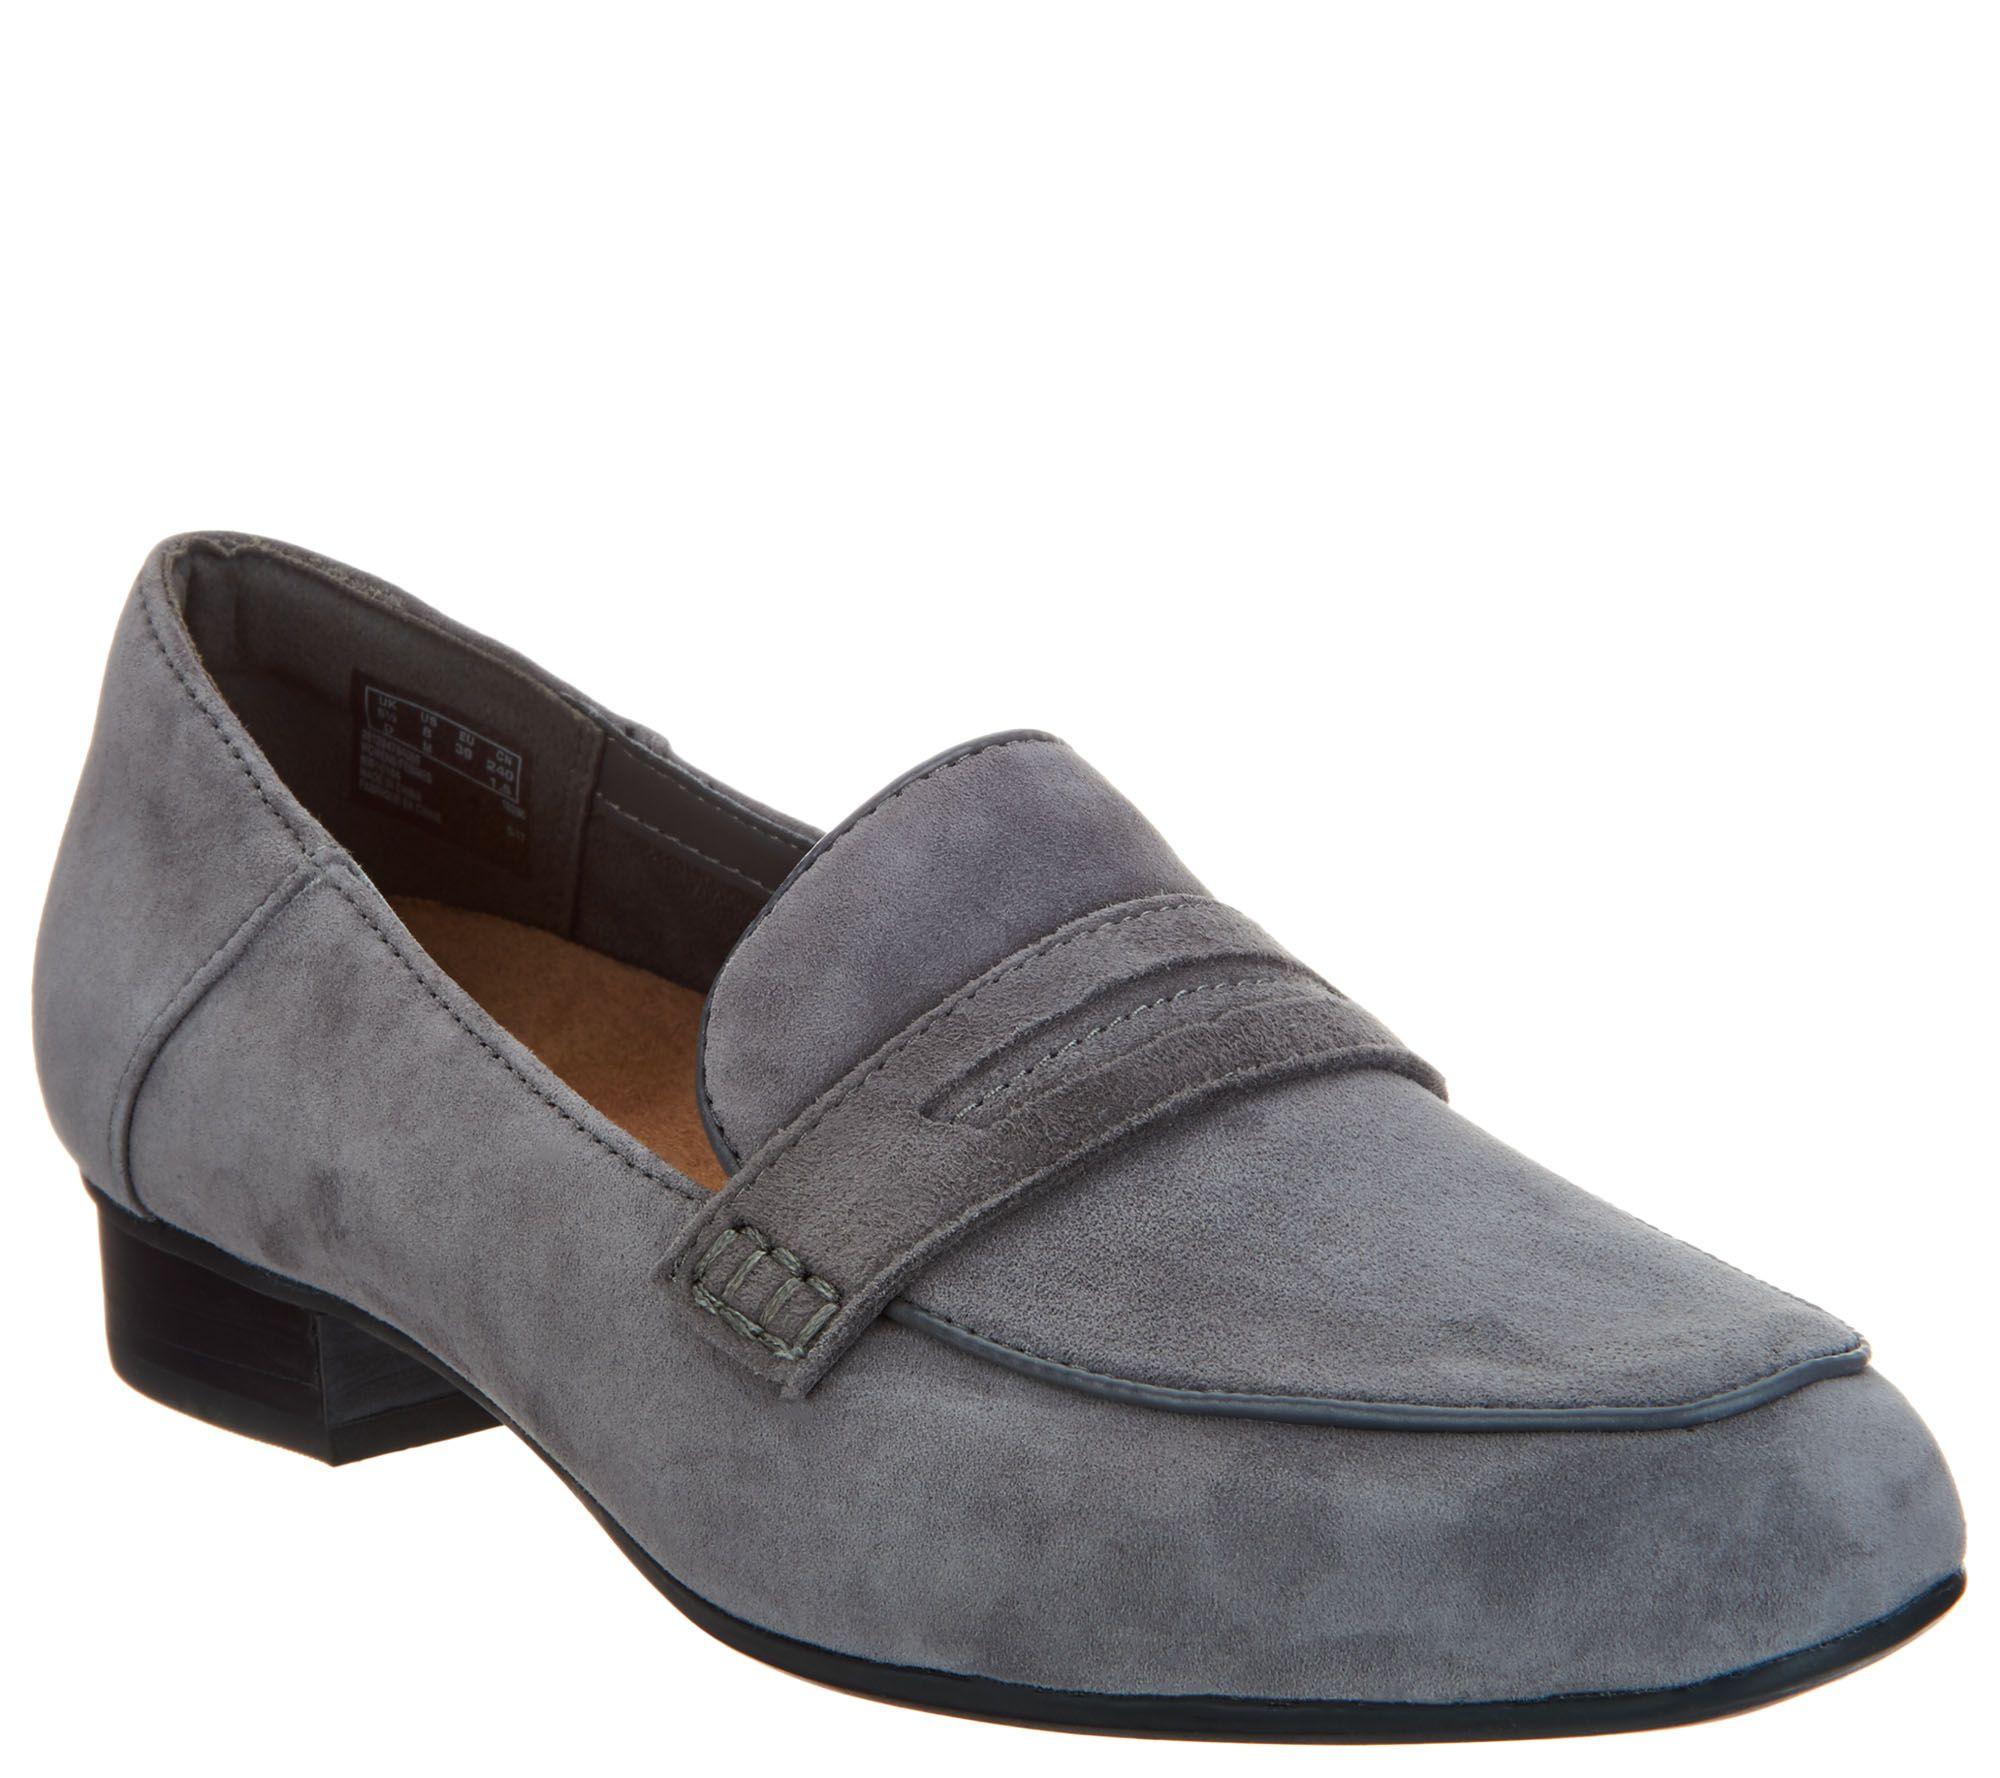 3295feb8c17 Clarks Artisan Suede Heeled Loafers - Keesha Cora - Page 1 — QVC.com